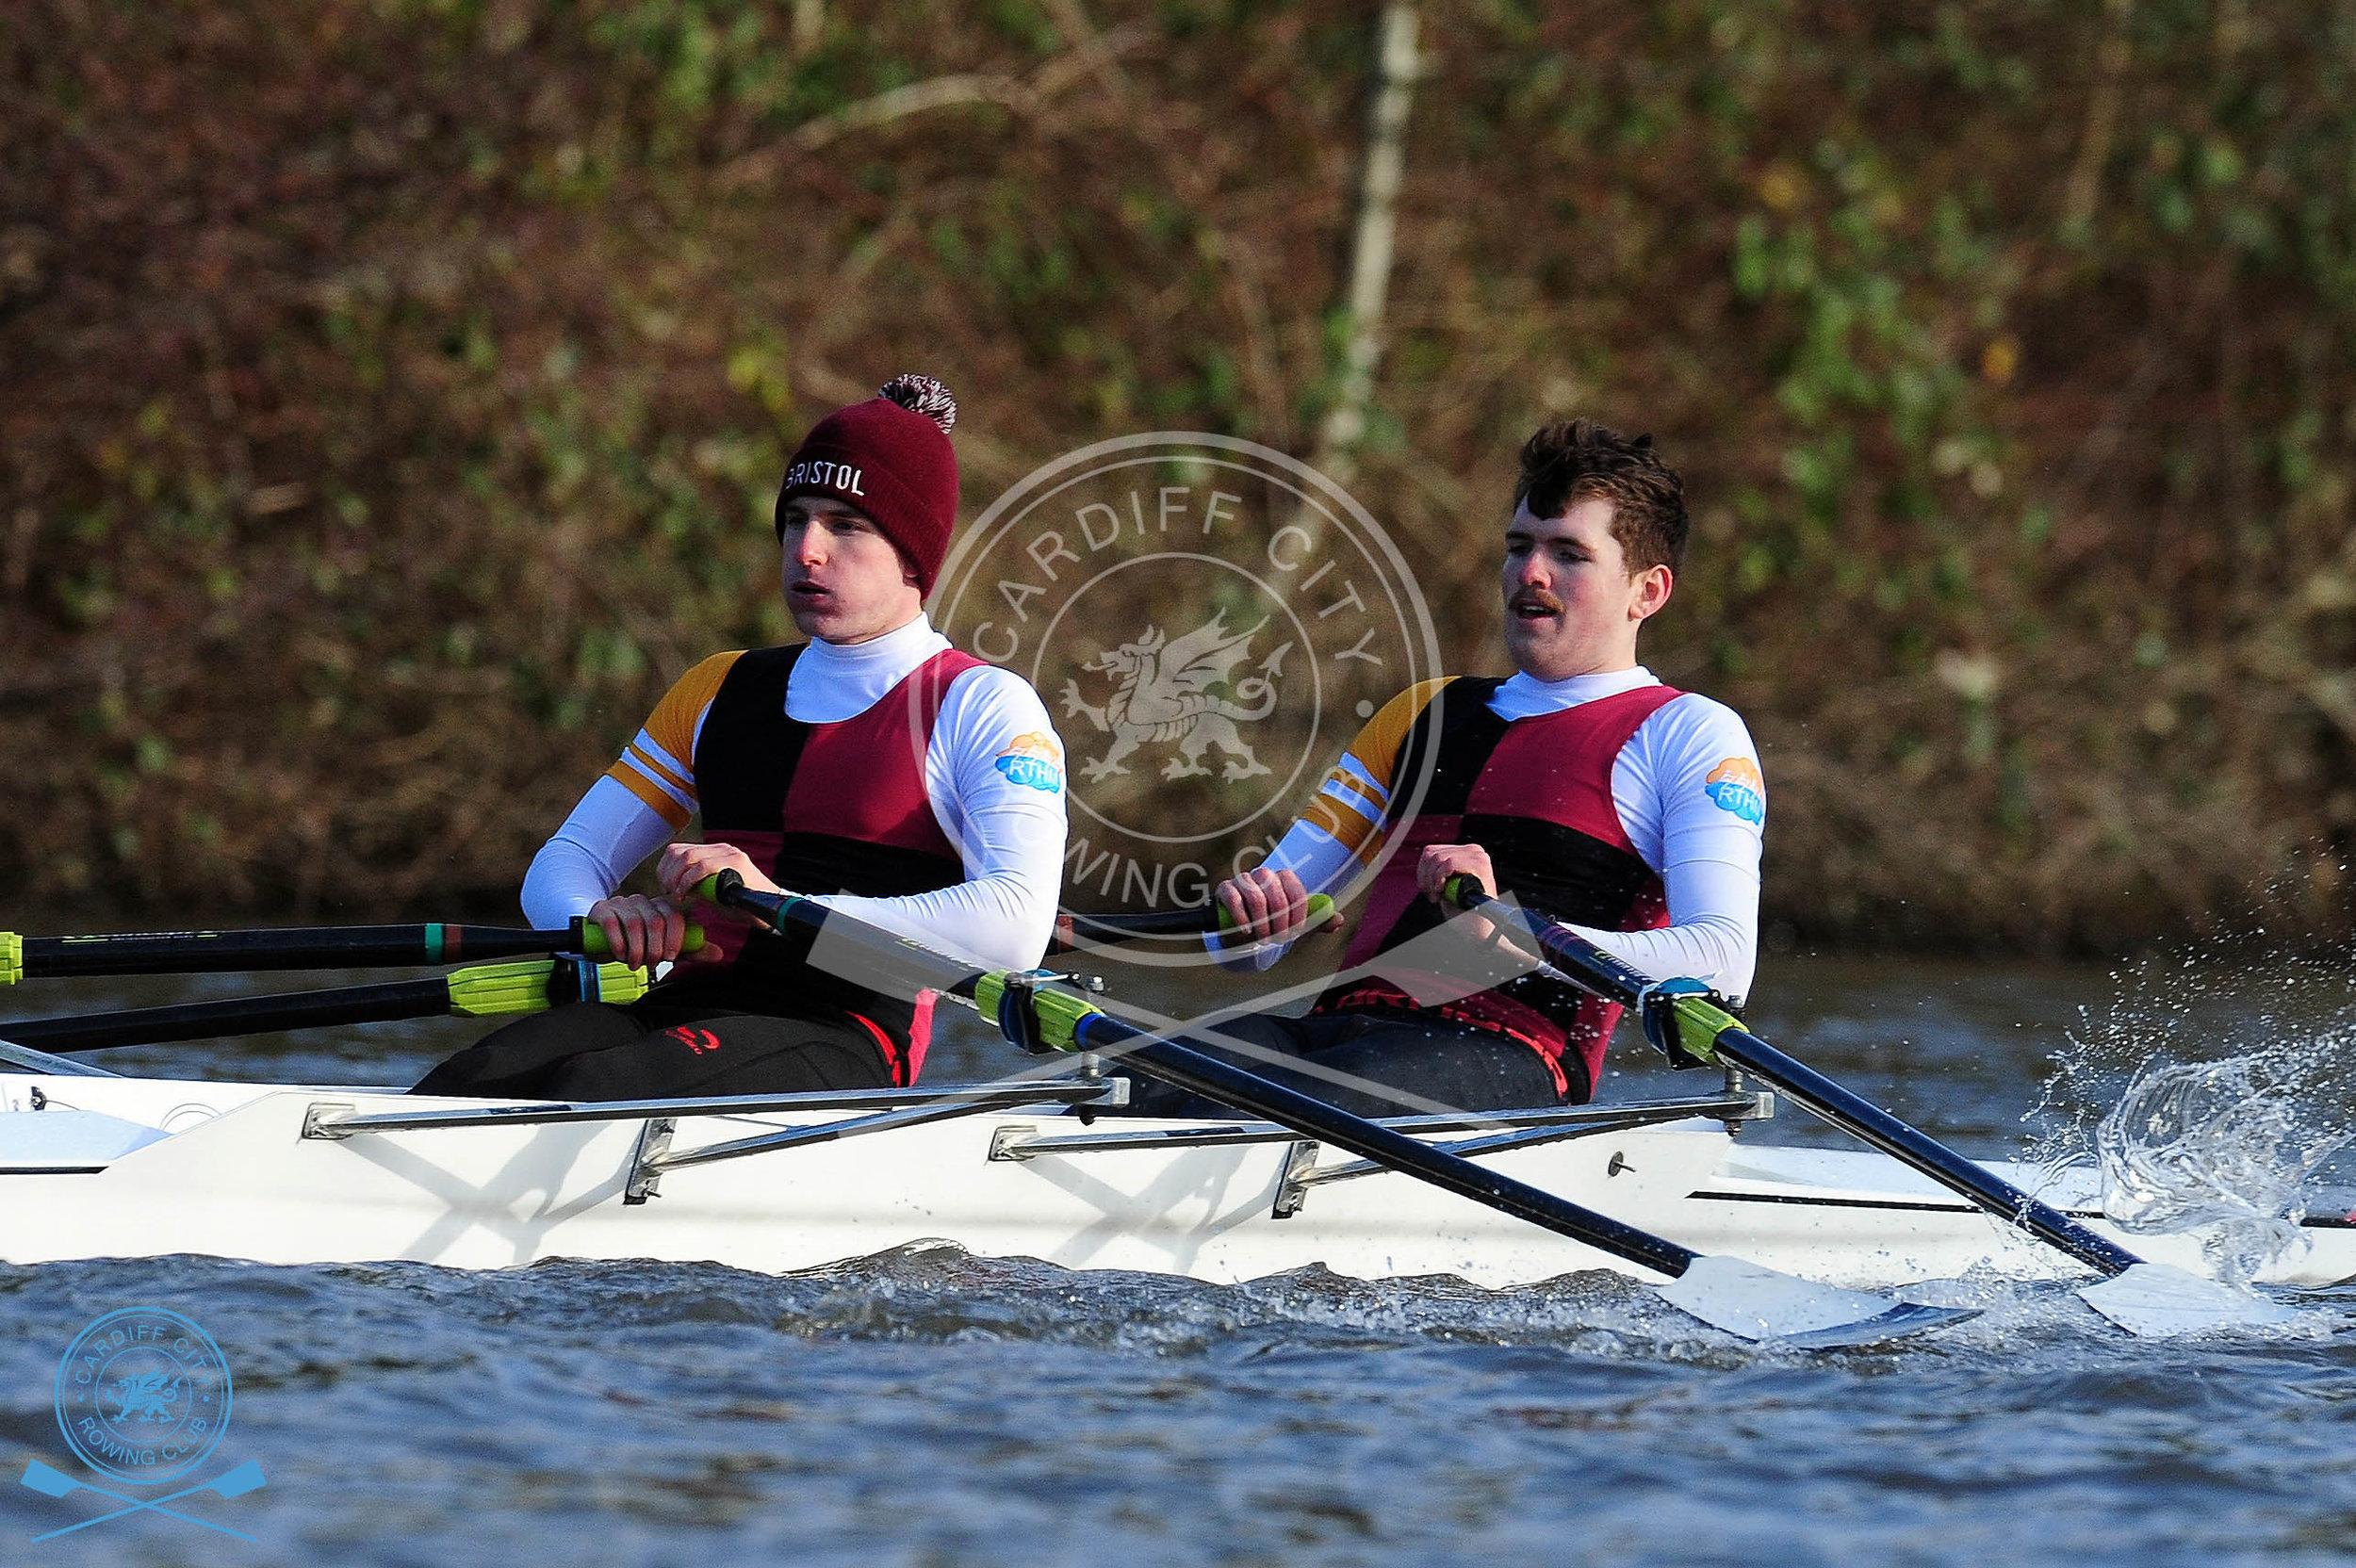 DW_280119_Cardiff_City_Rowing_325.jpg